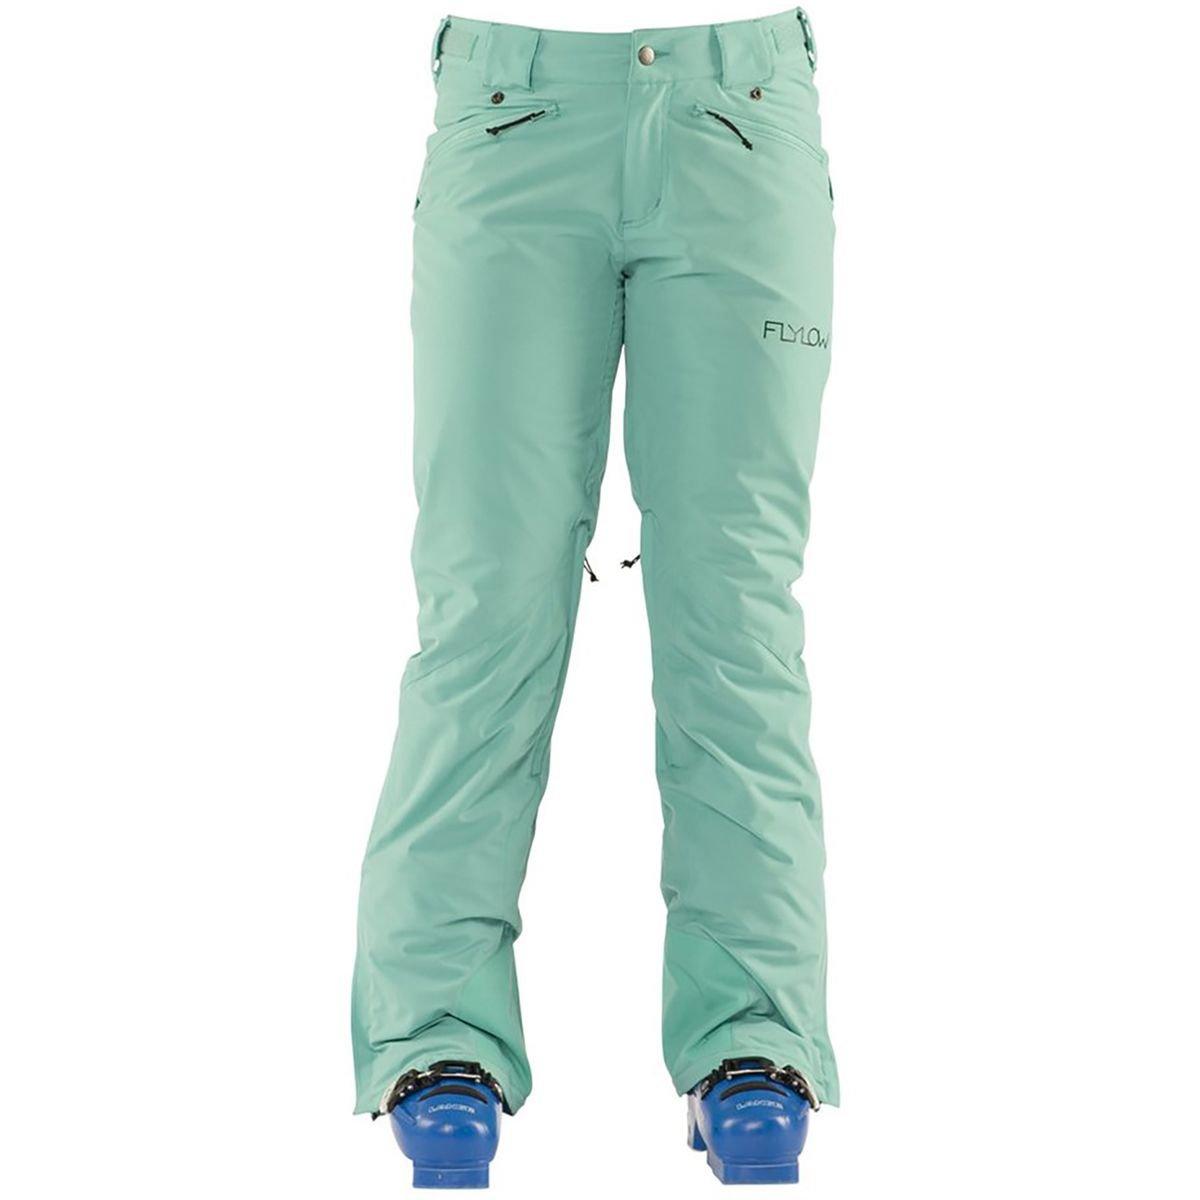 Flylow Diasy Insulated Pant – Women 's B073X7N4CM X-Small|Siren Siren X-Small